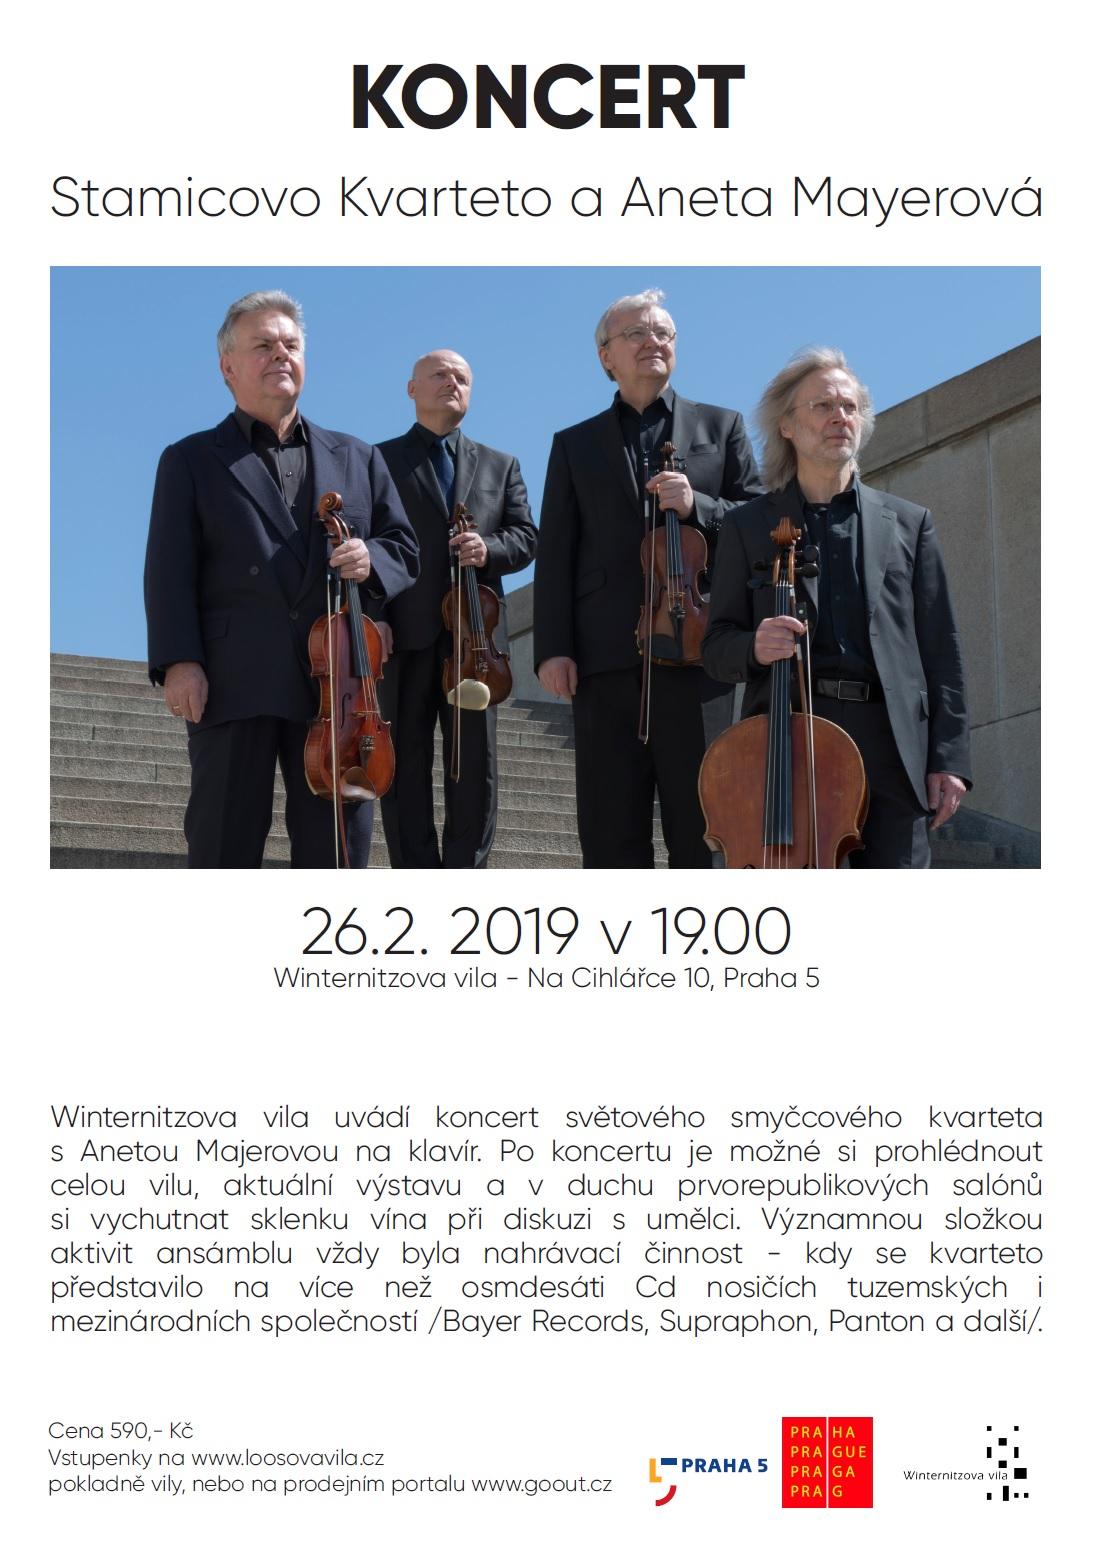 stamicovo-kvarteto-ve-winternitzove-vile